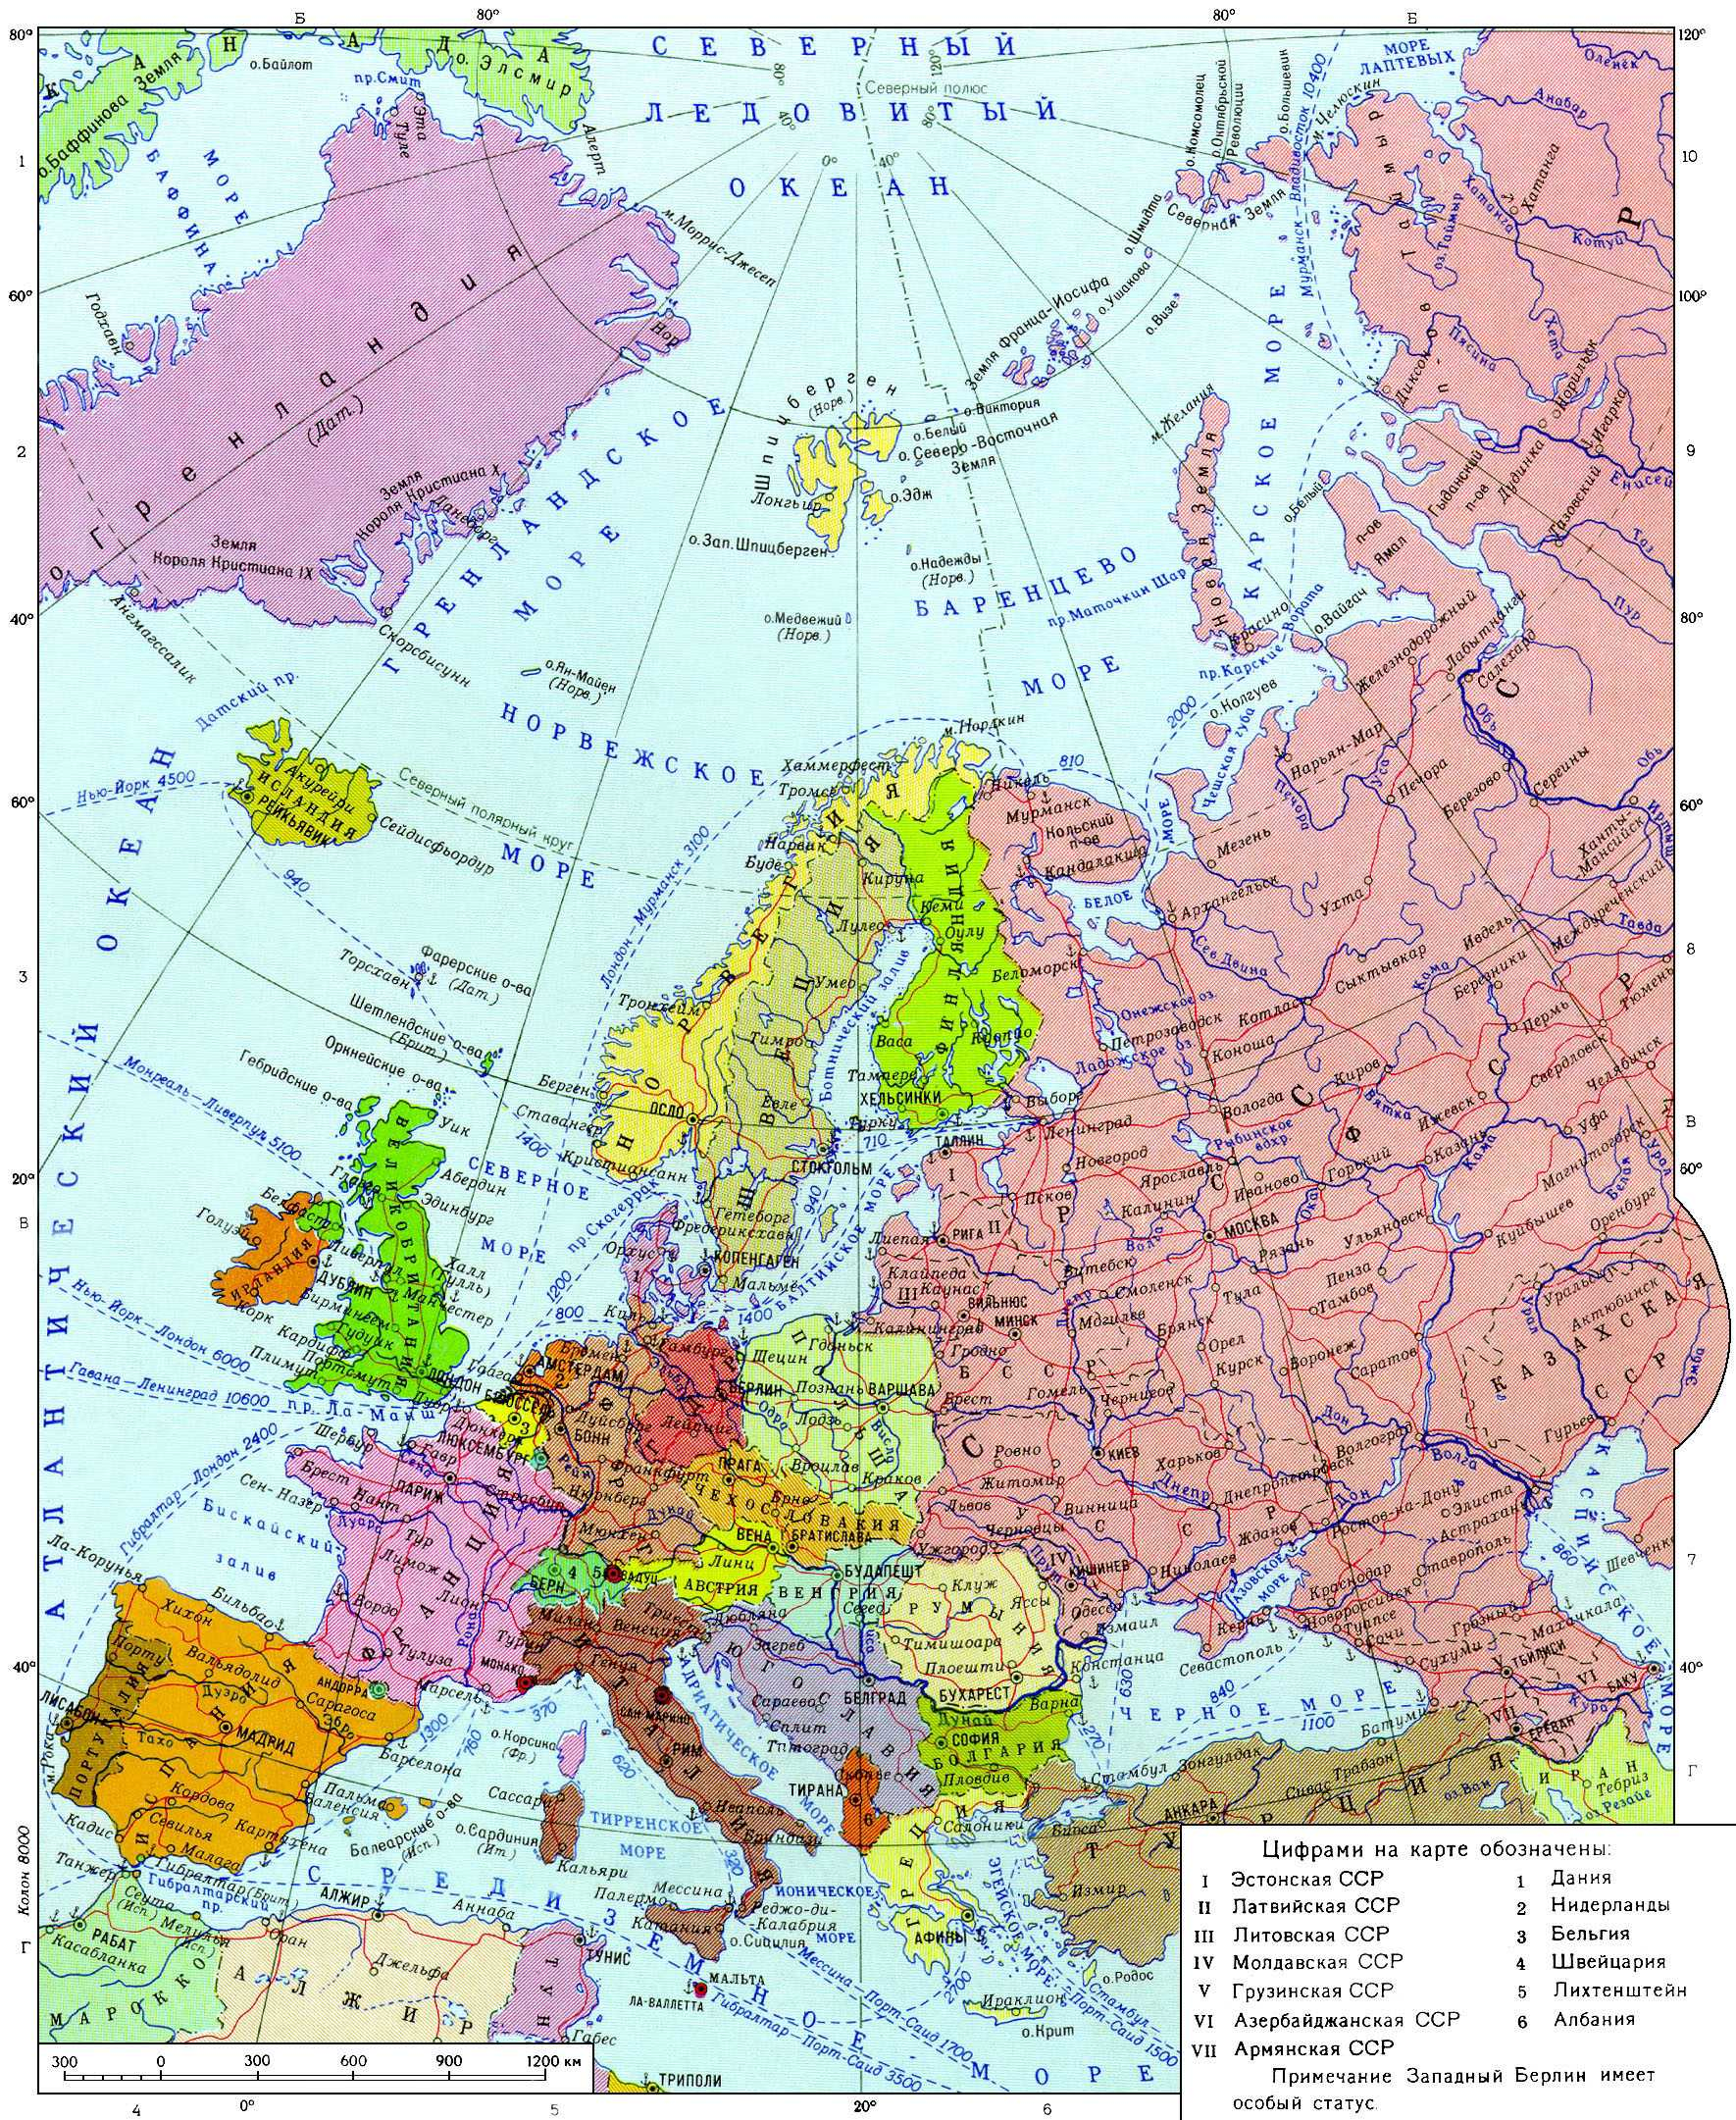 064-europe1991